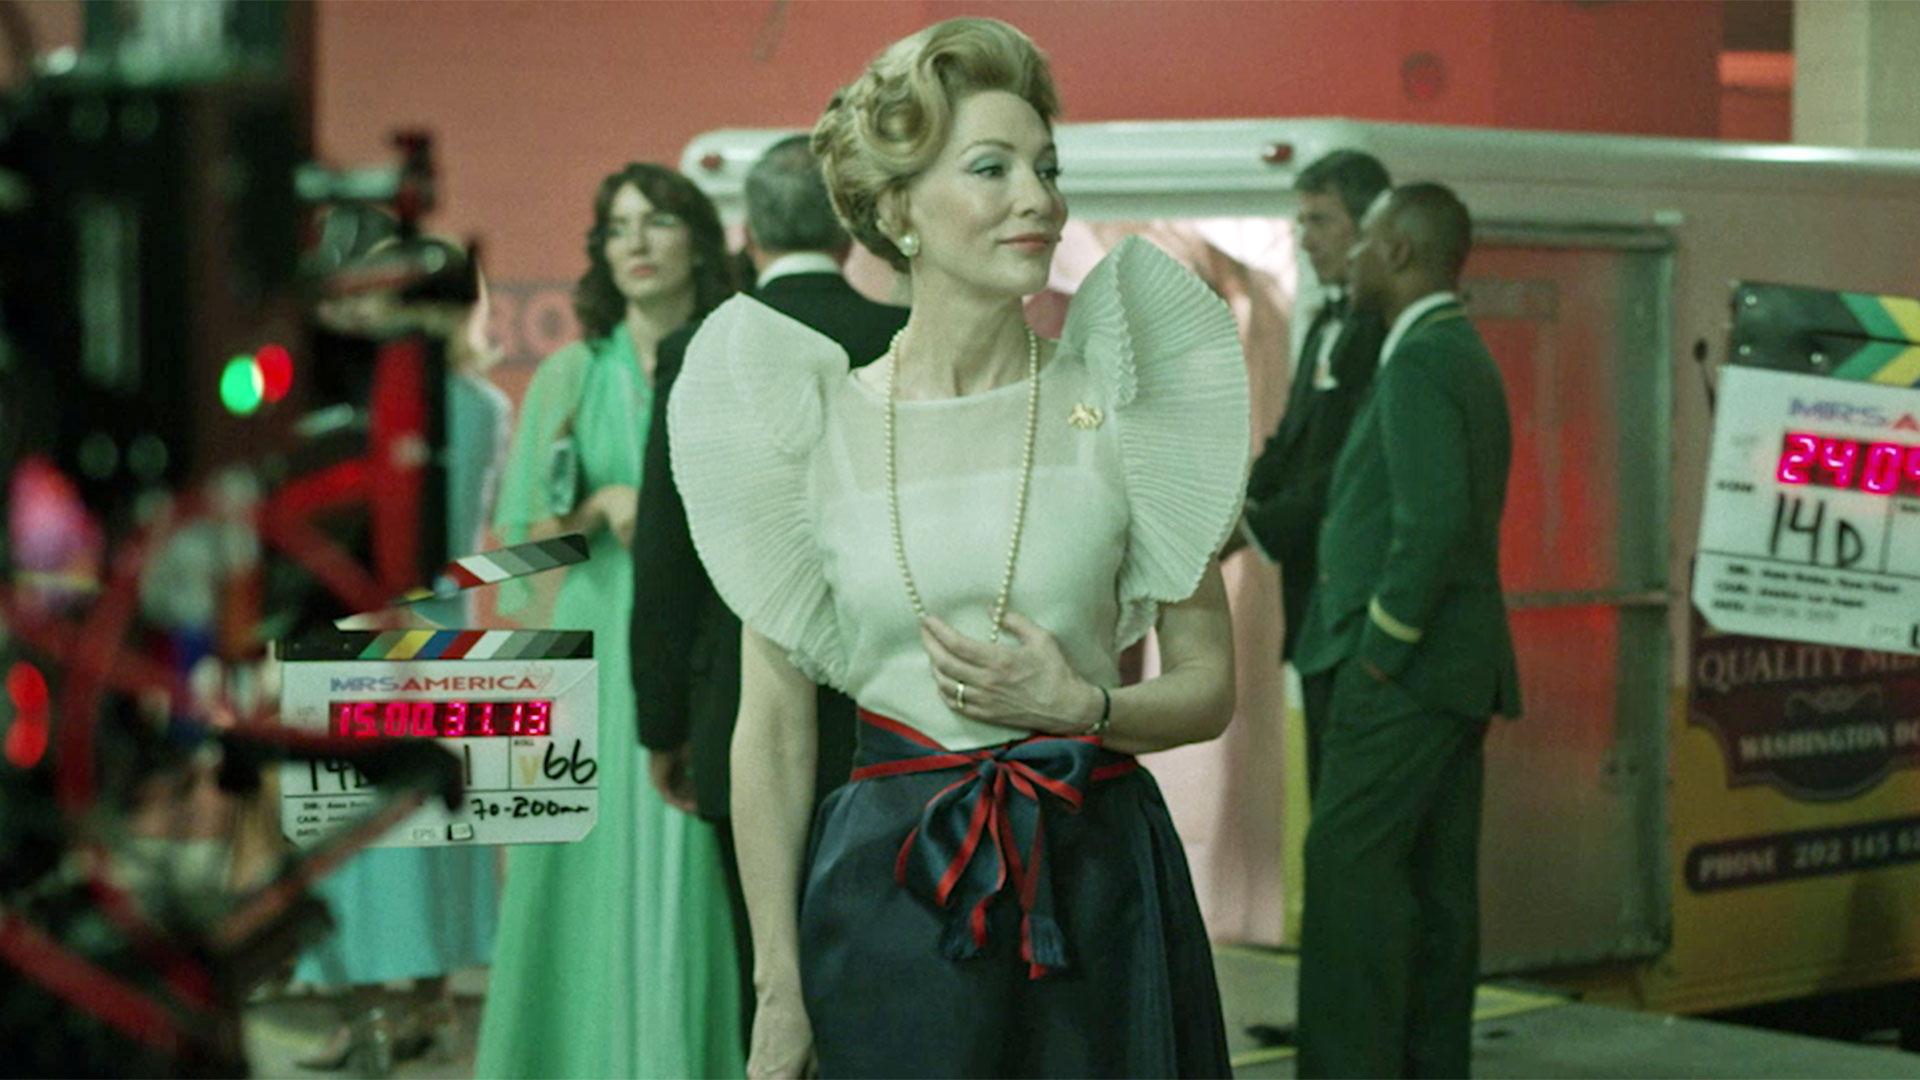 Inside Look: Stylizing Mrs. America - Costumes